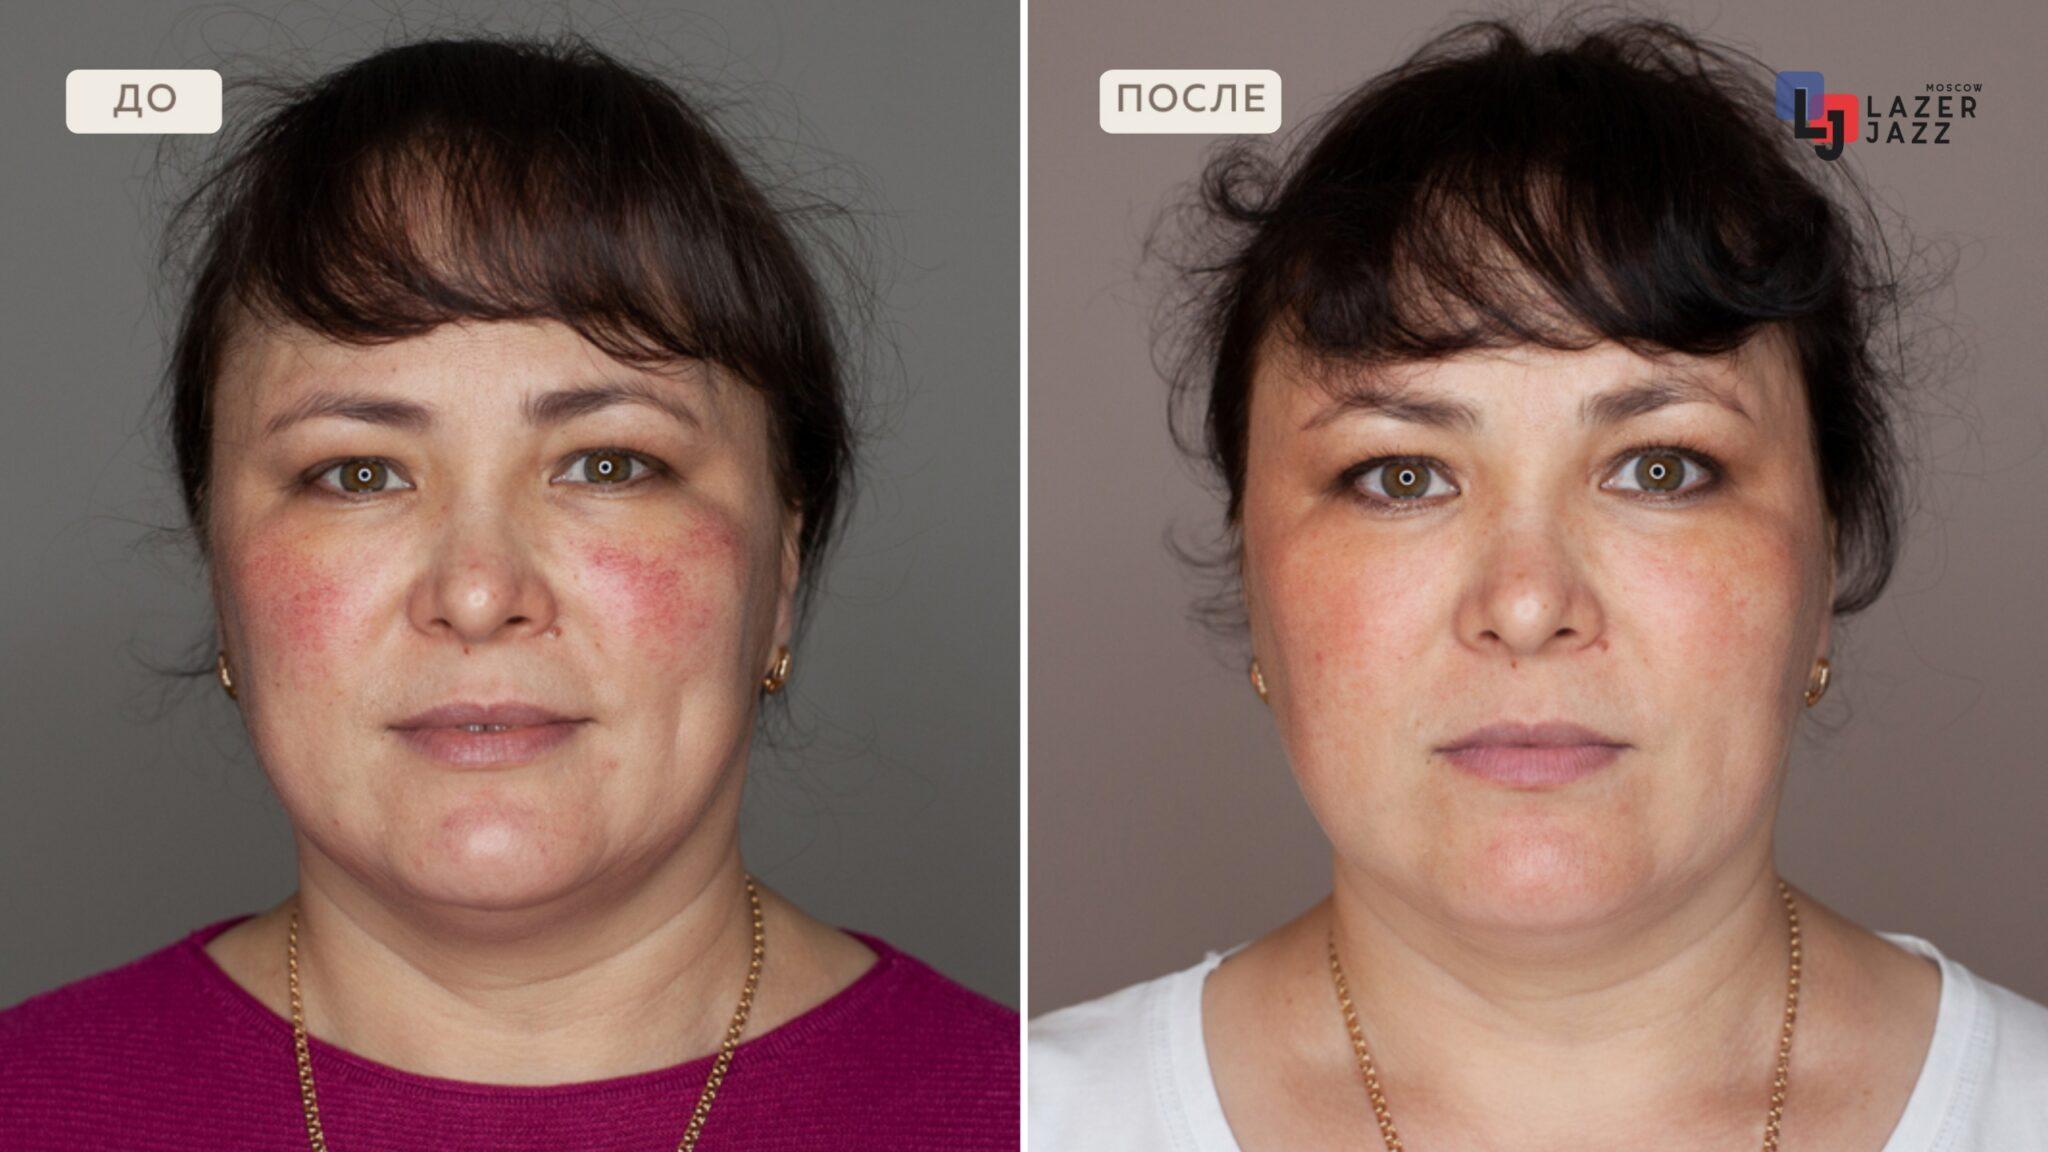 Lechenie-rozacea-pacientka-38-let-scaled-1